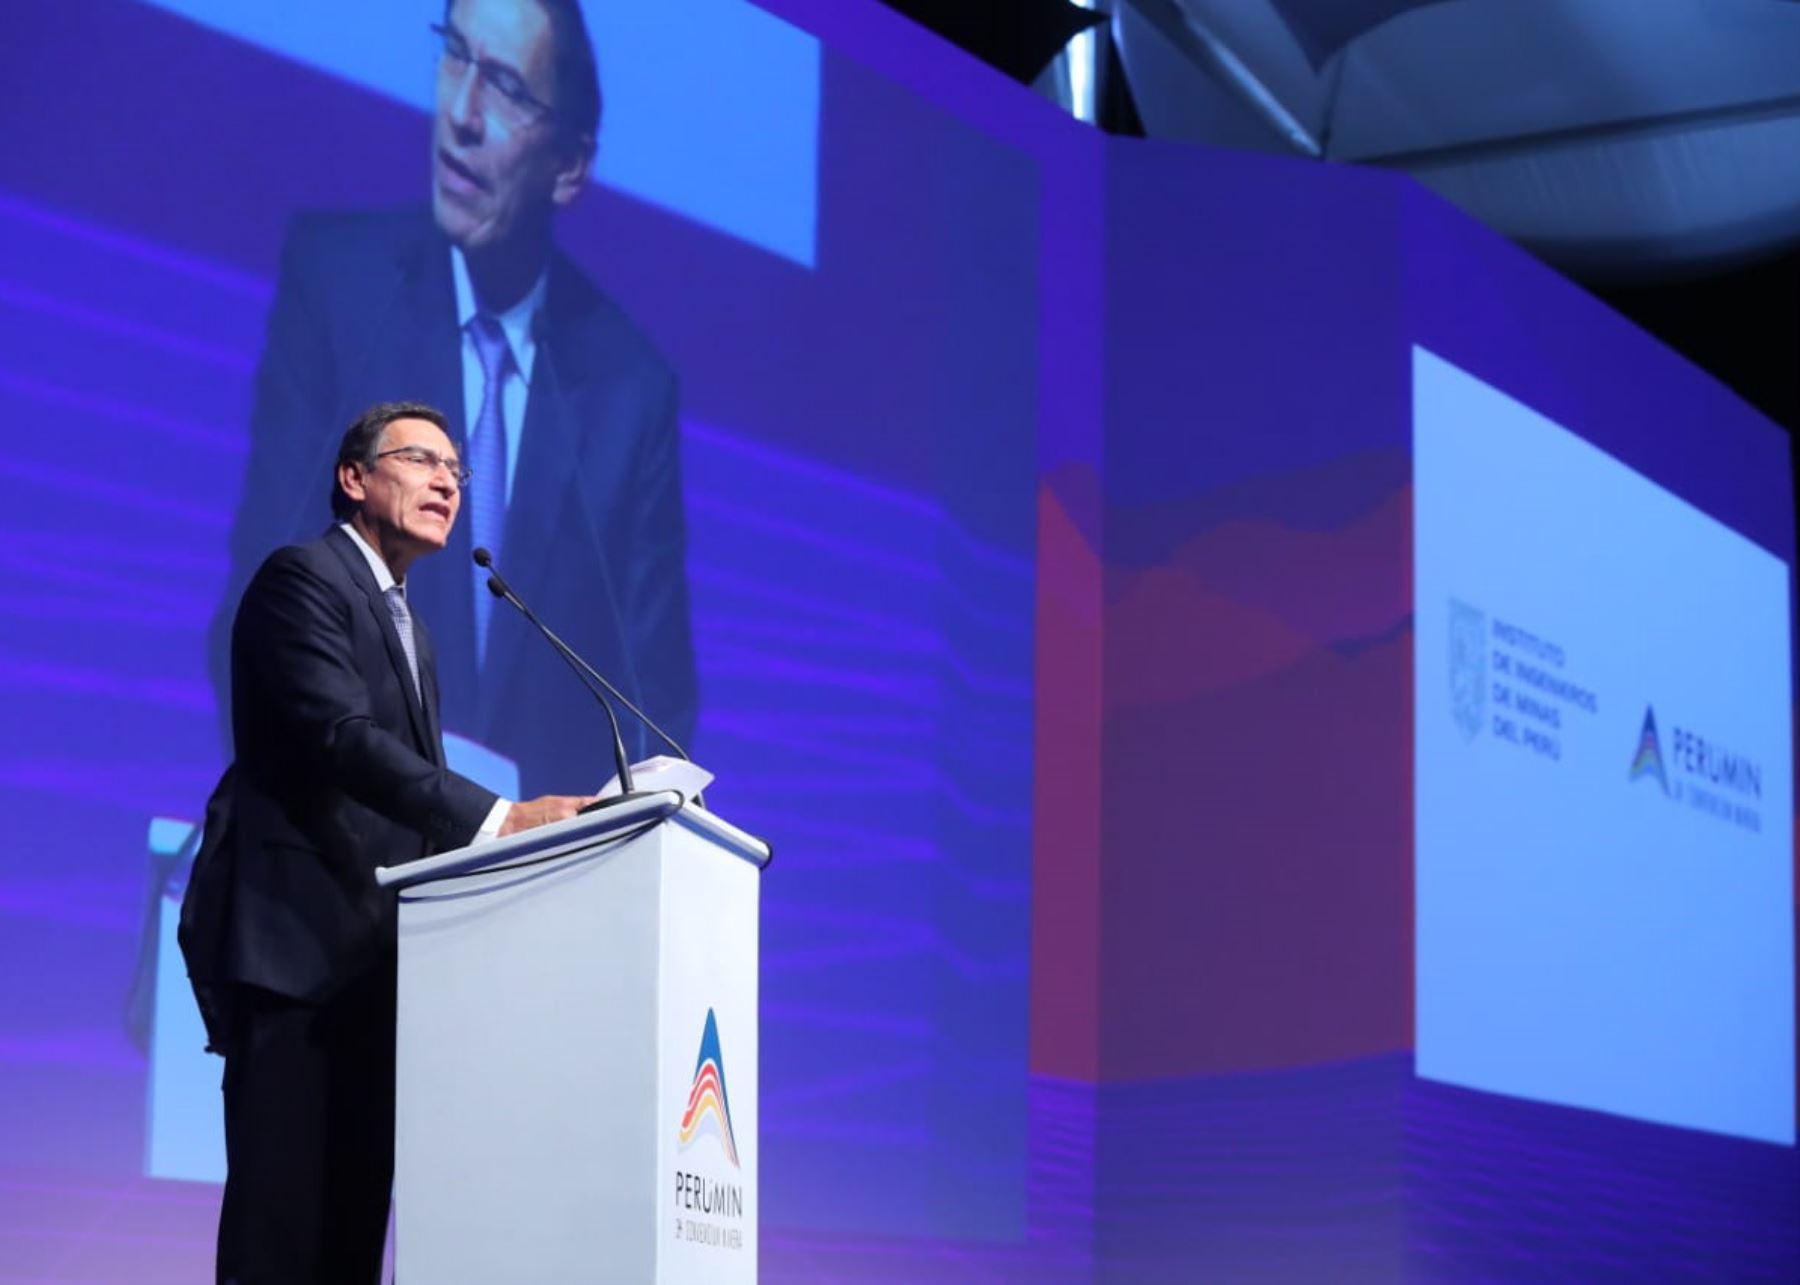 Presidente Martín Vizcarra asiste a Convención Minera Perumin en Arequipa.